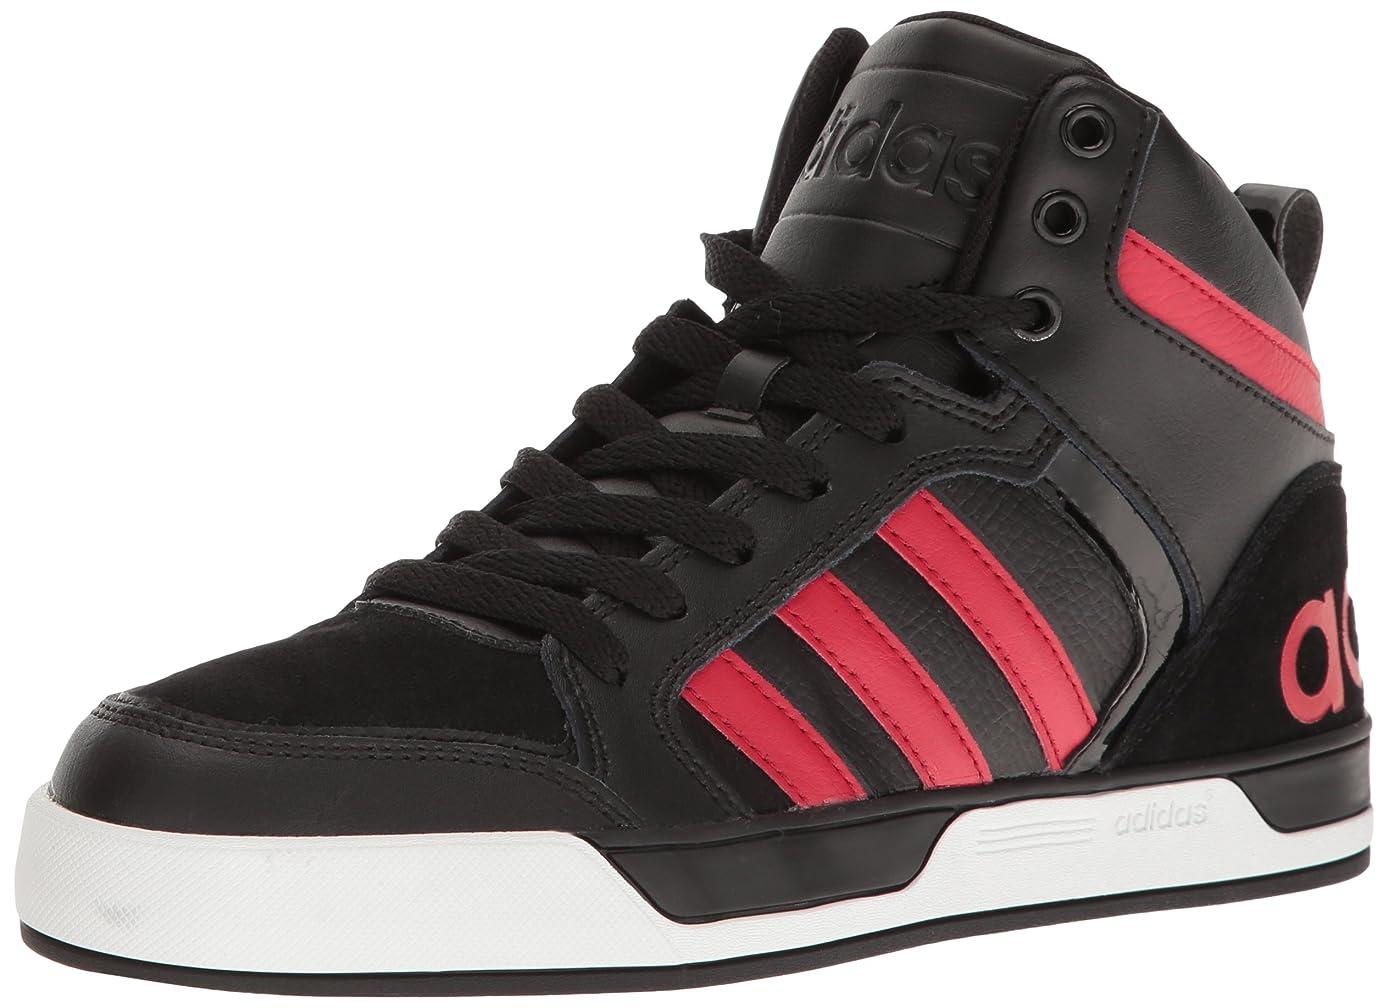 adidas Men's Shoe's Raleigh 9TIS MID Sneaker